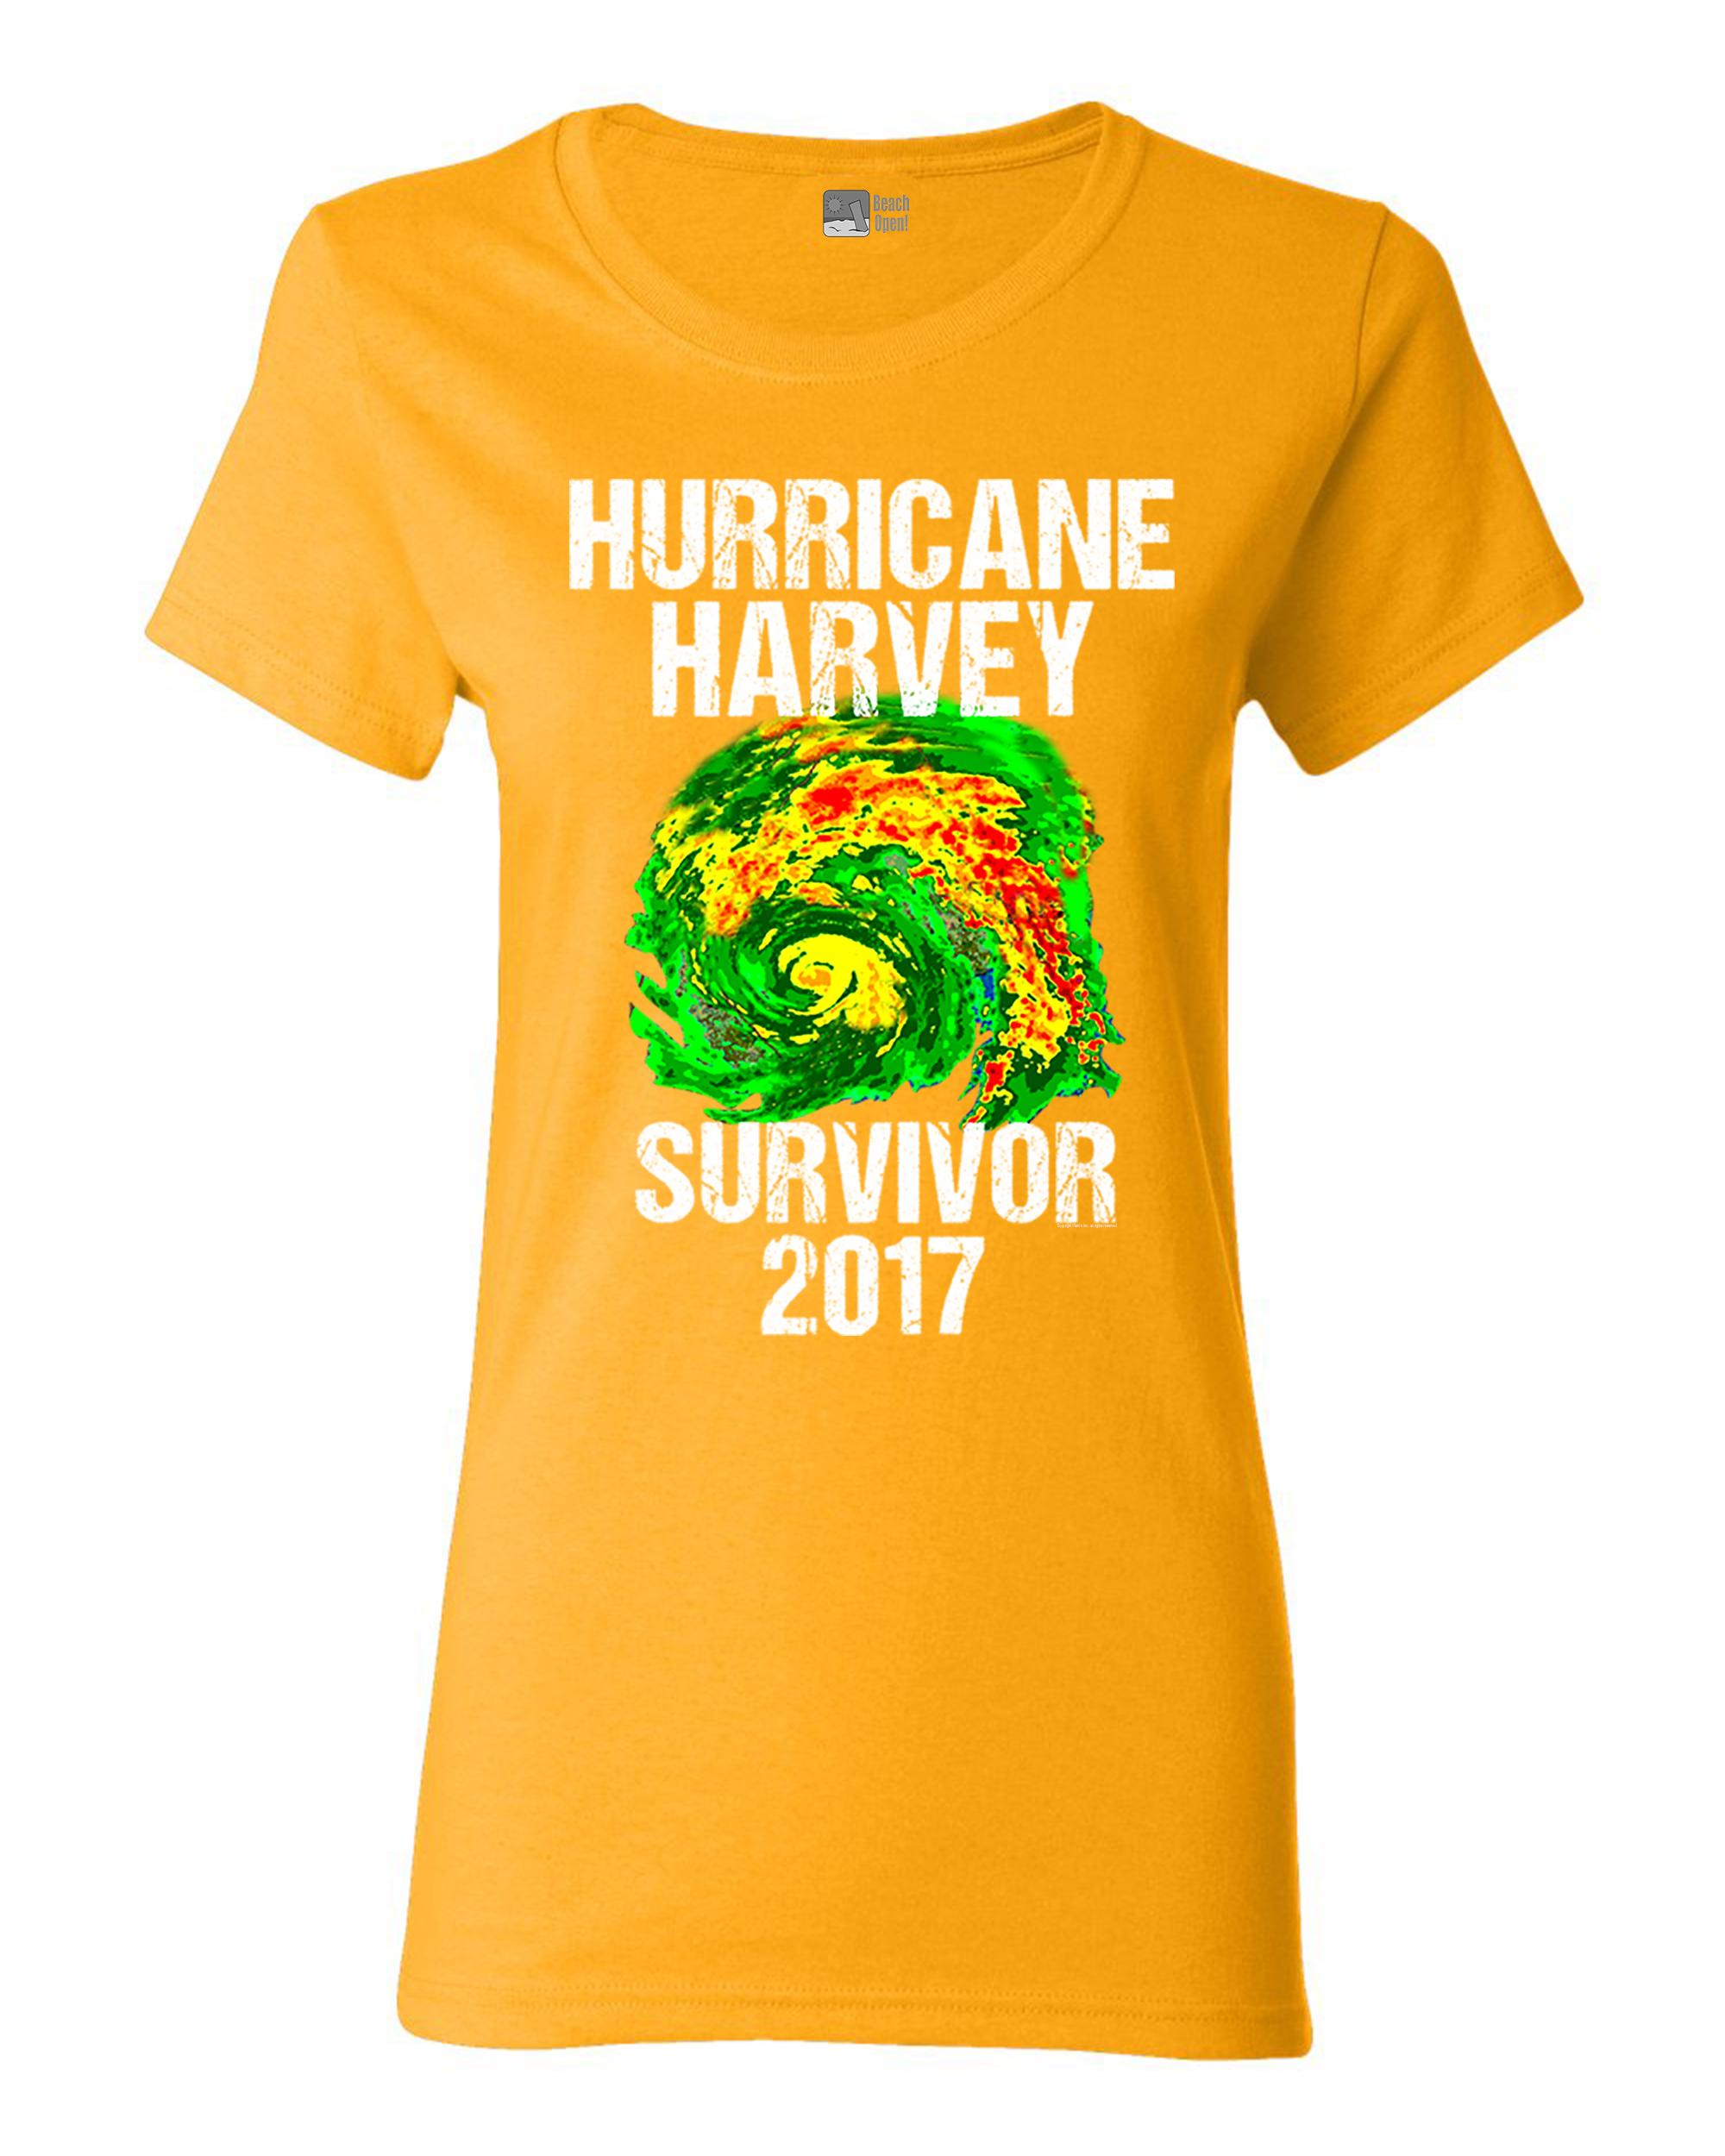 Ladies Hurricane Harvey Storm Survivor Houston Texas 2017 DT T-Shirt Tee